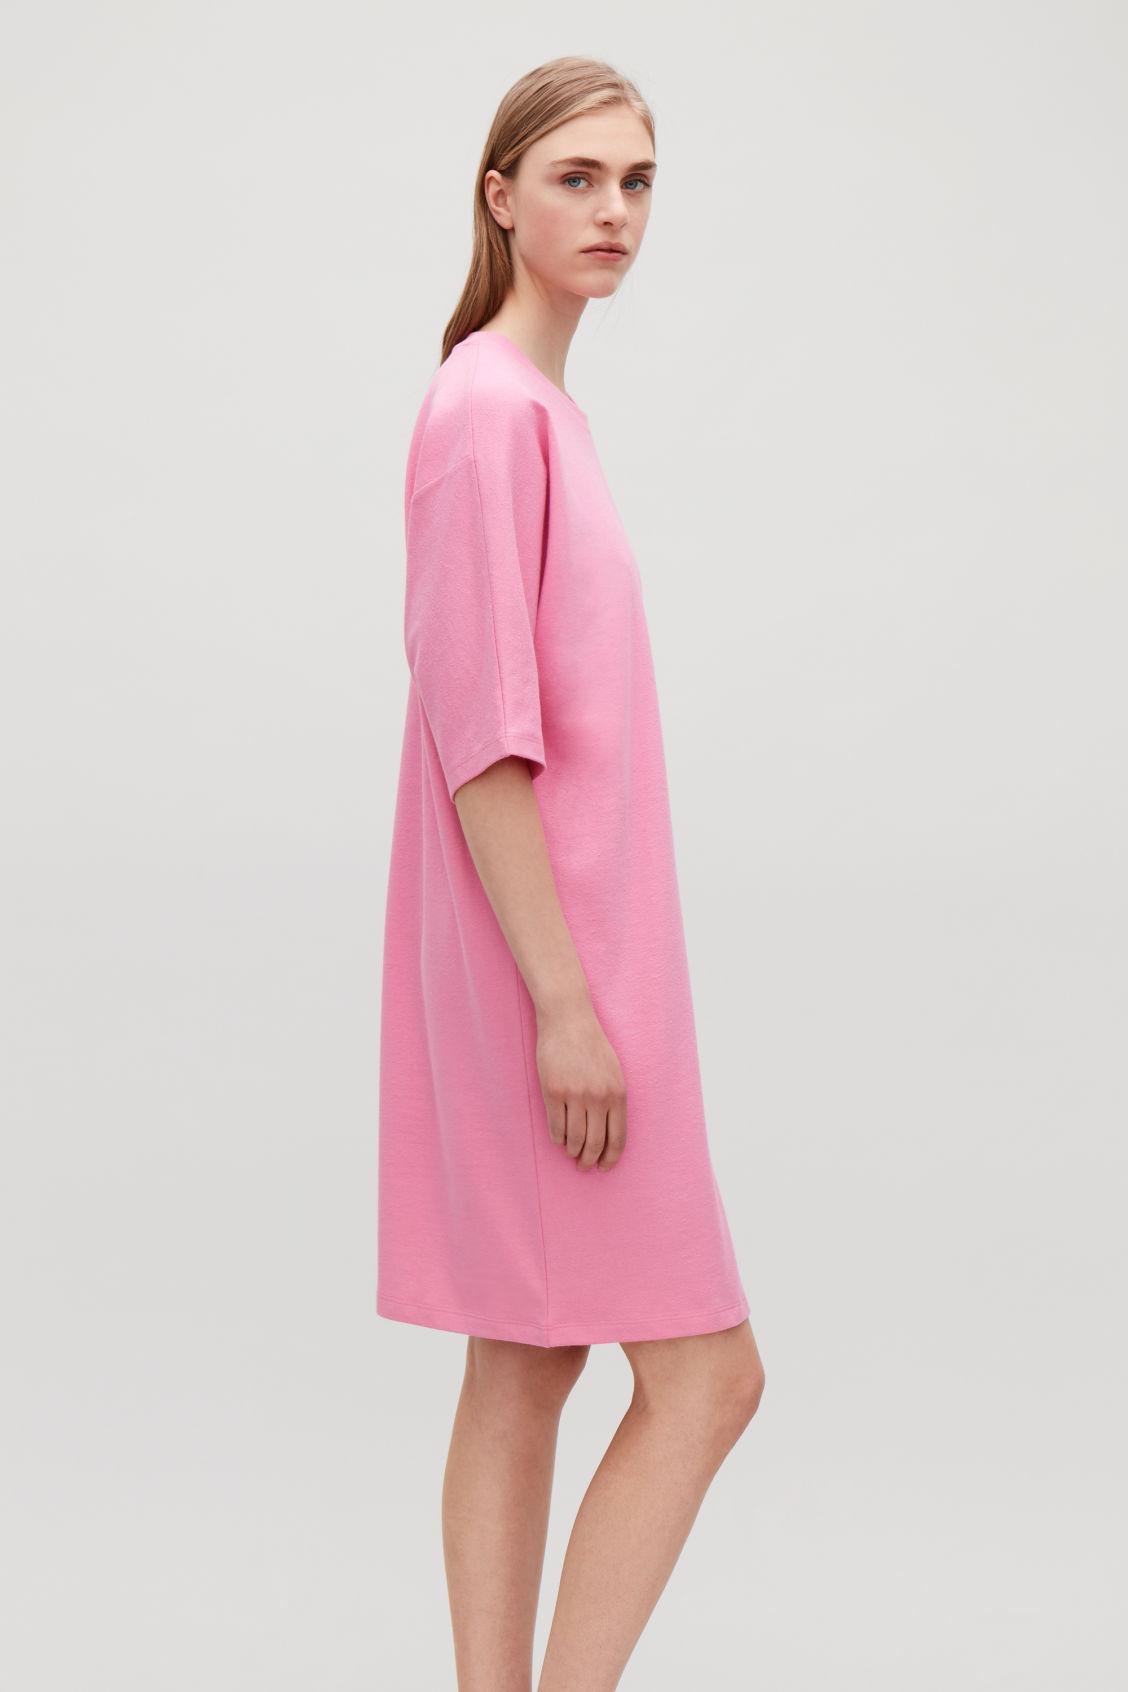 db797e578e2 TEXTURED KIMONO-SLEEVED DRESS - Bubblegum pink - Dresses - COS